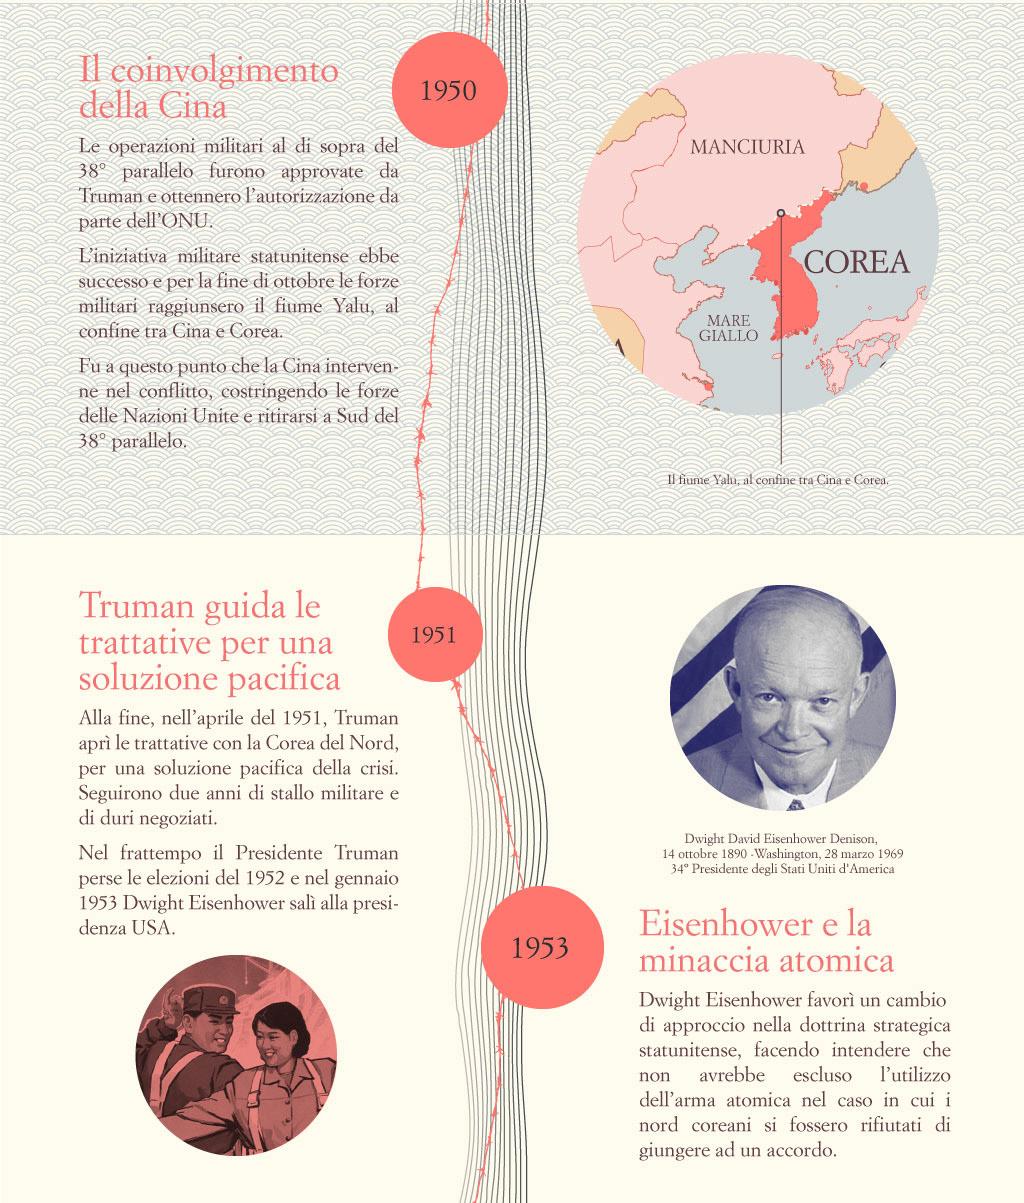 giornalismo infografica storia